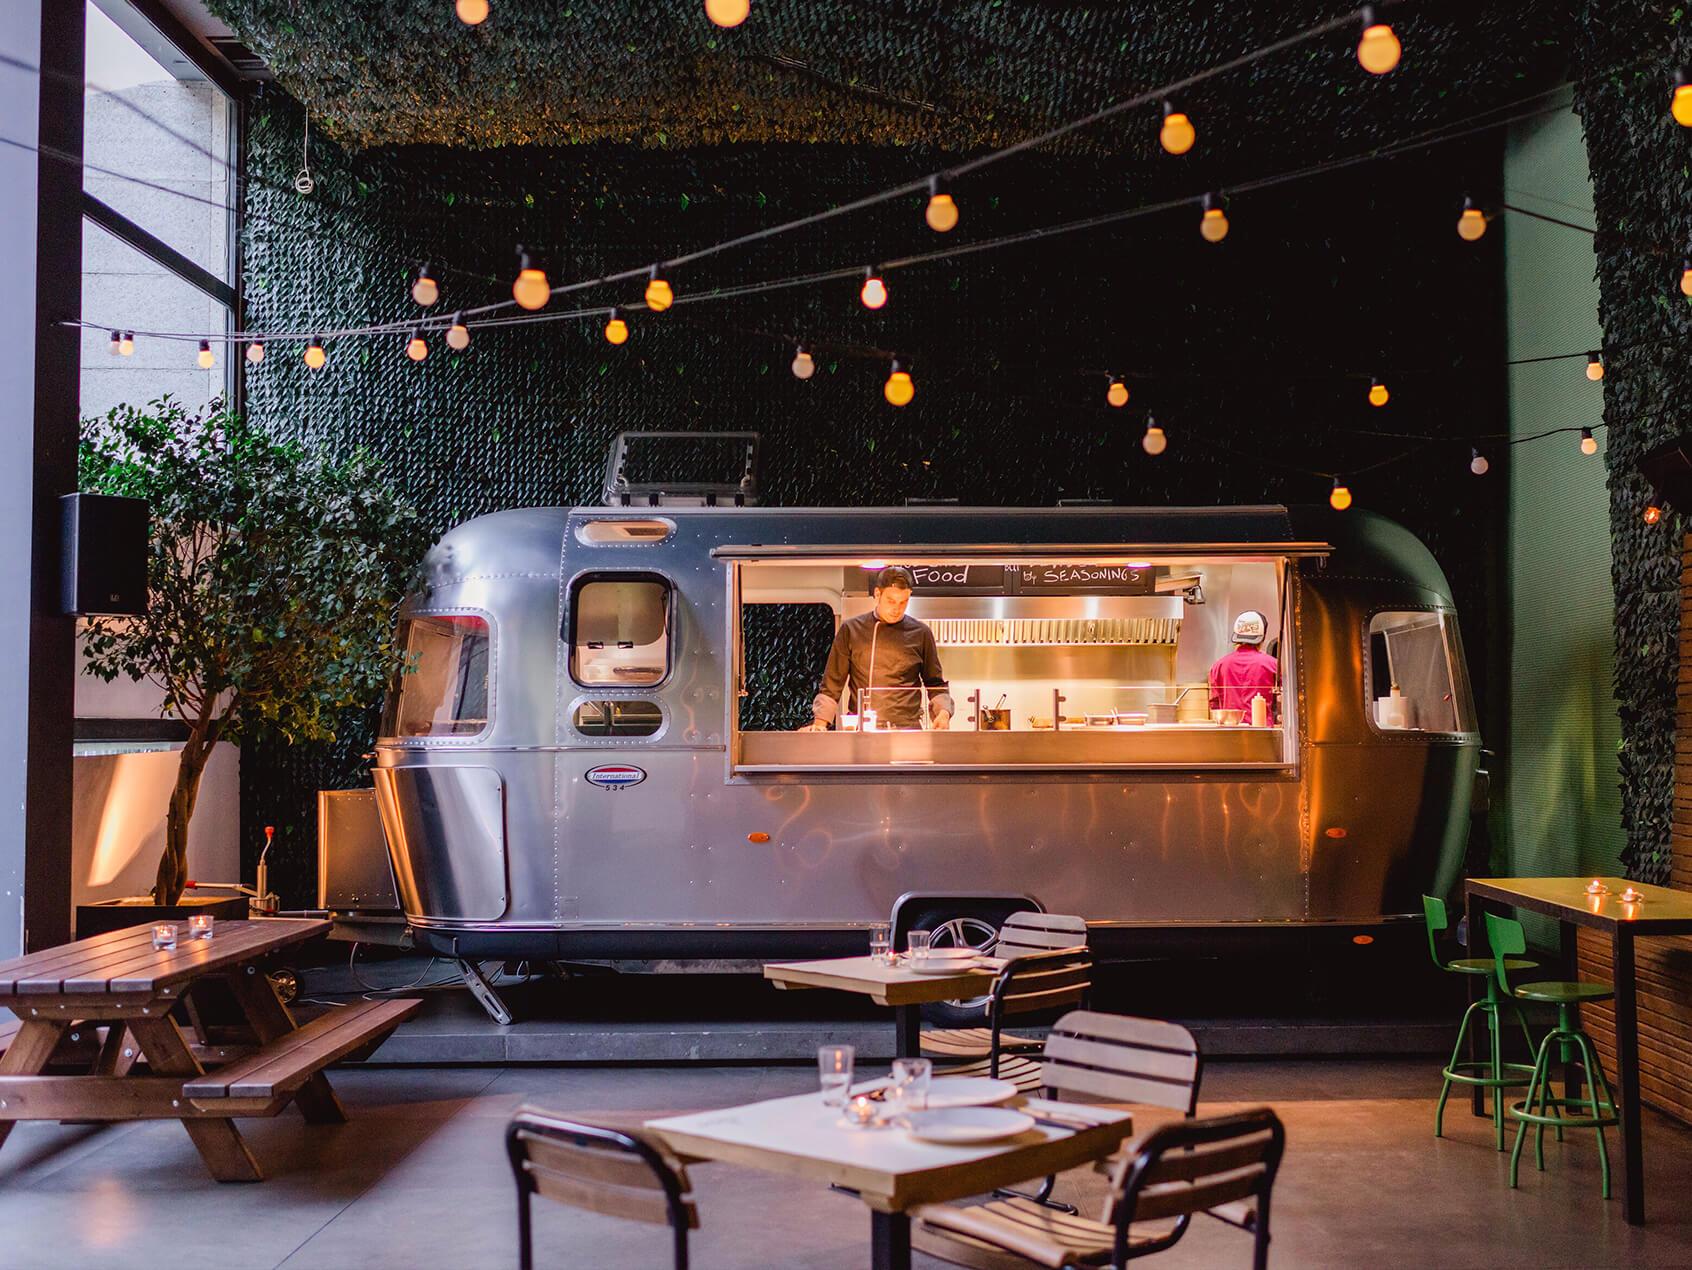 Restaurants in orlando on international drive